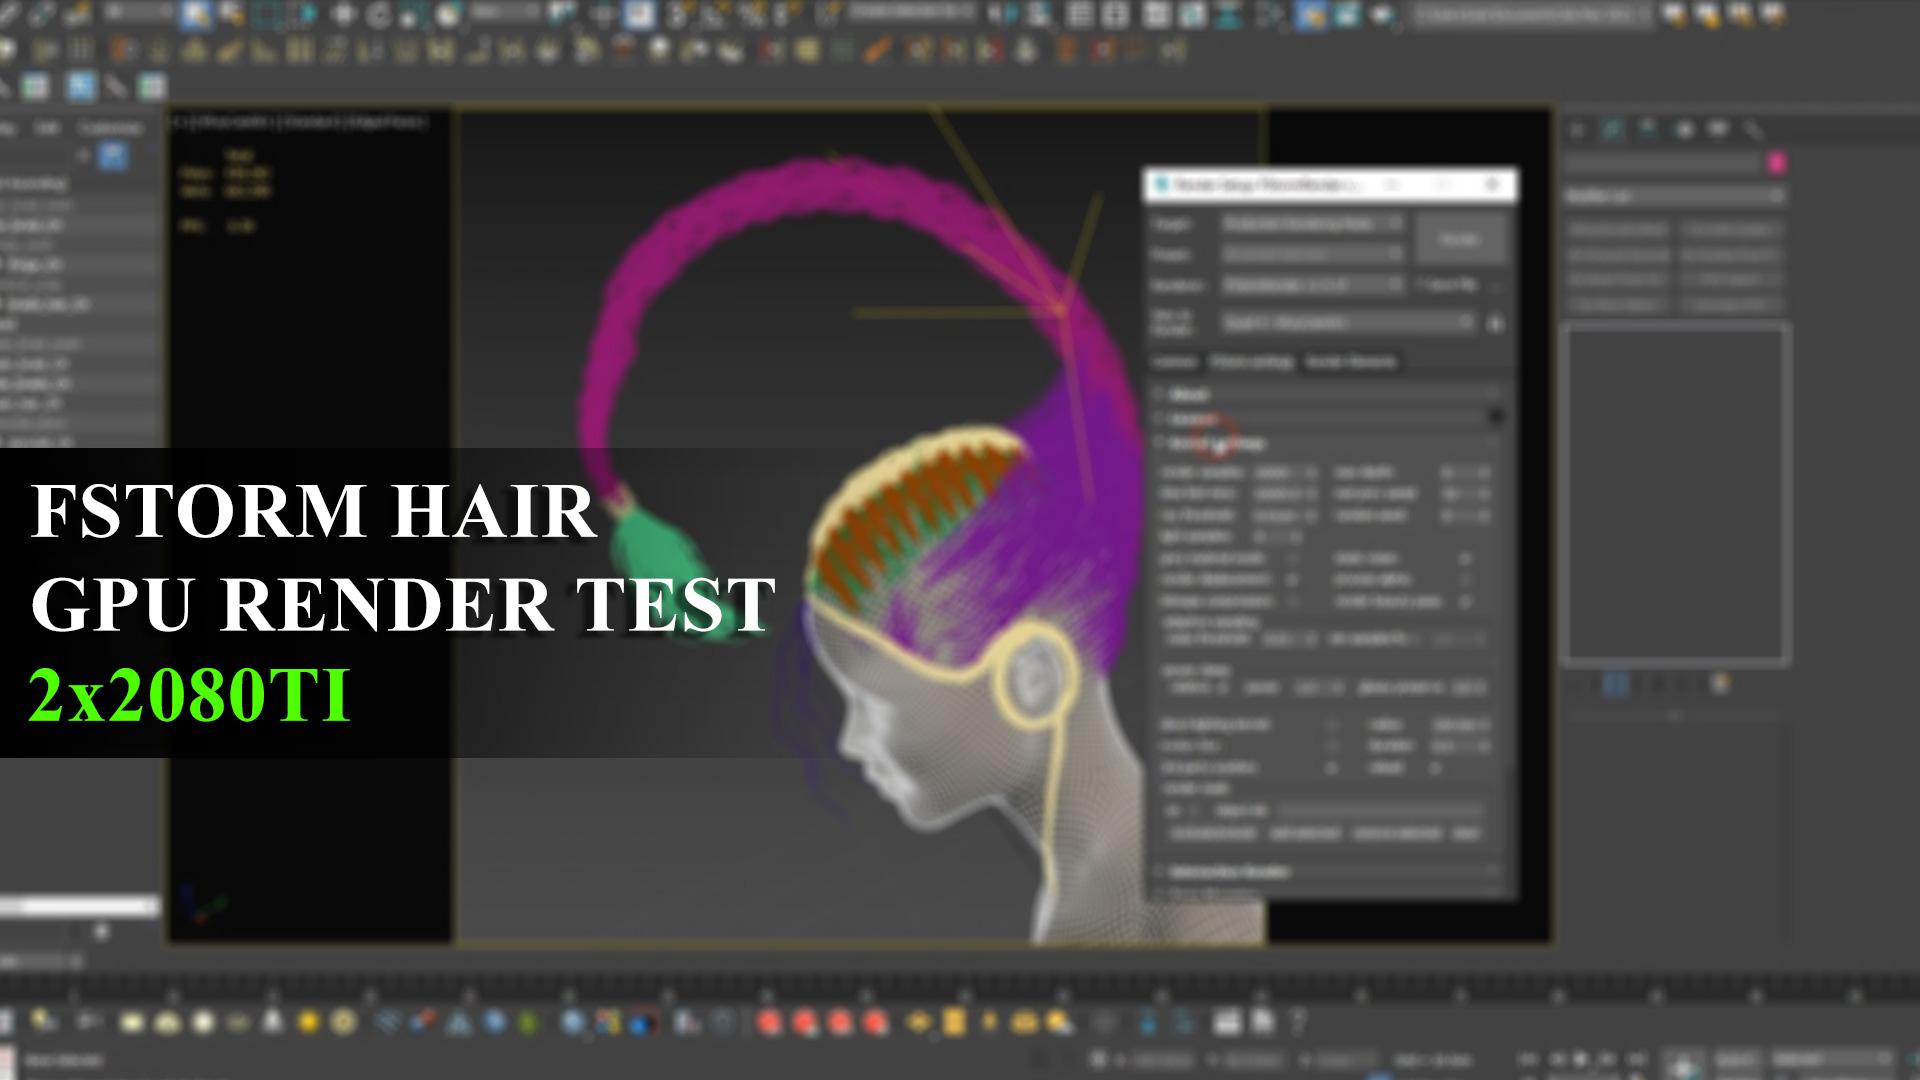 fstorm_hair_render_test_2x2080ti.mp4_snapshot_00.45.879.jpg